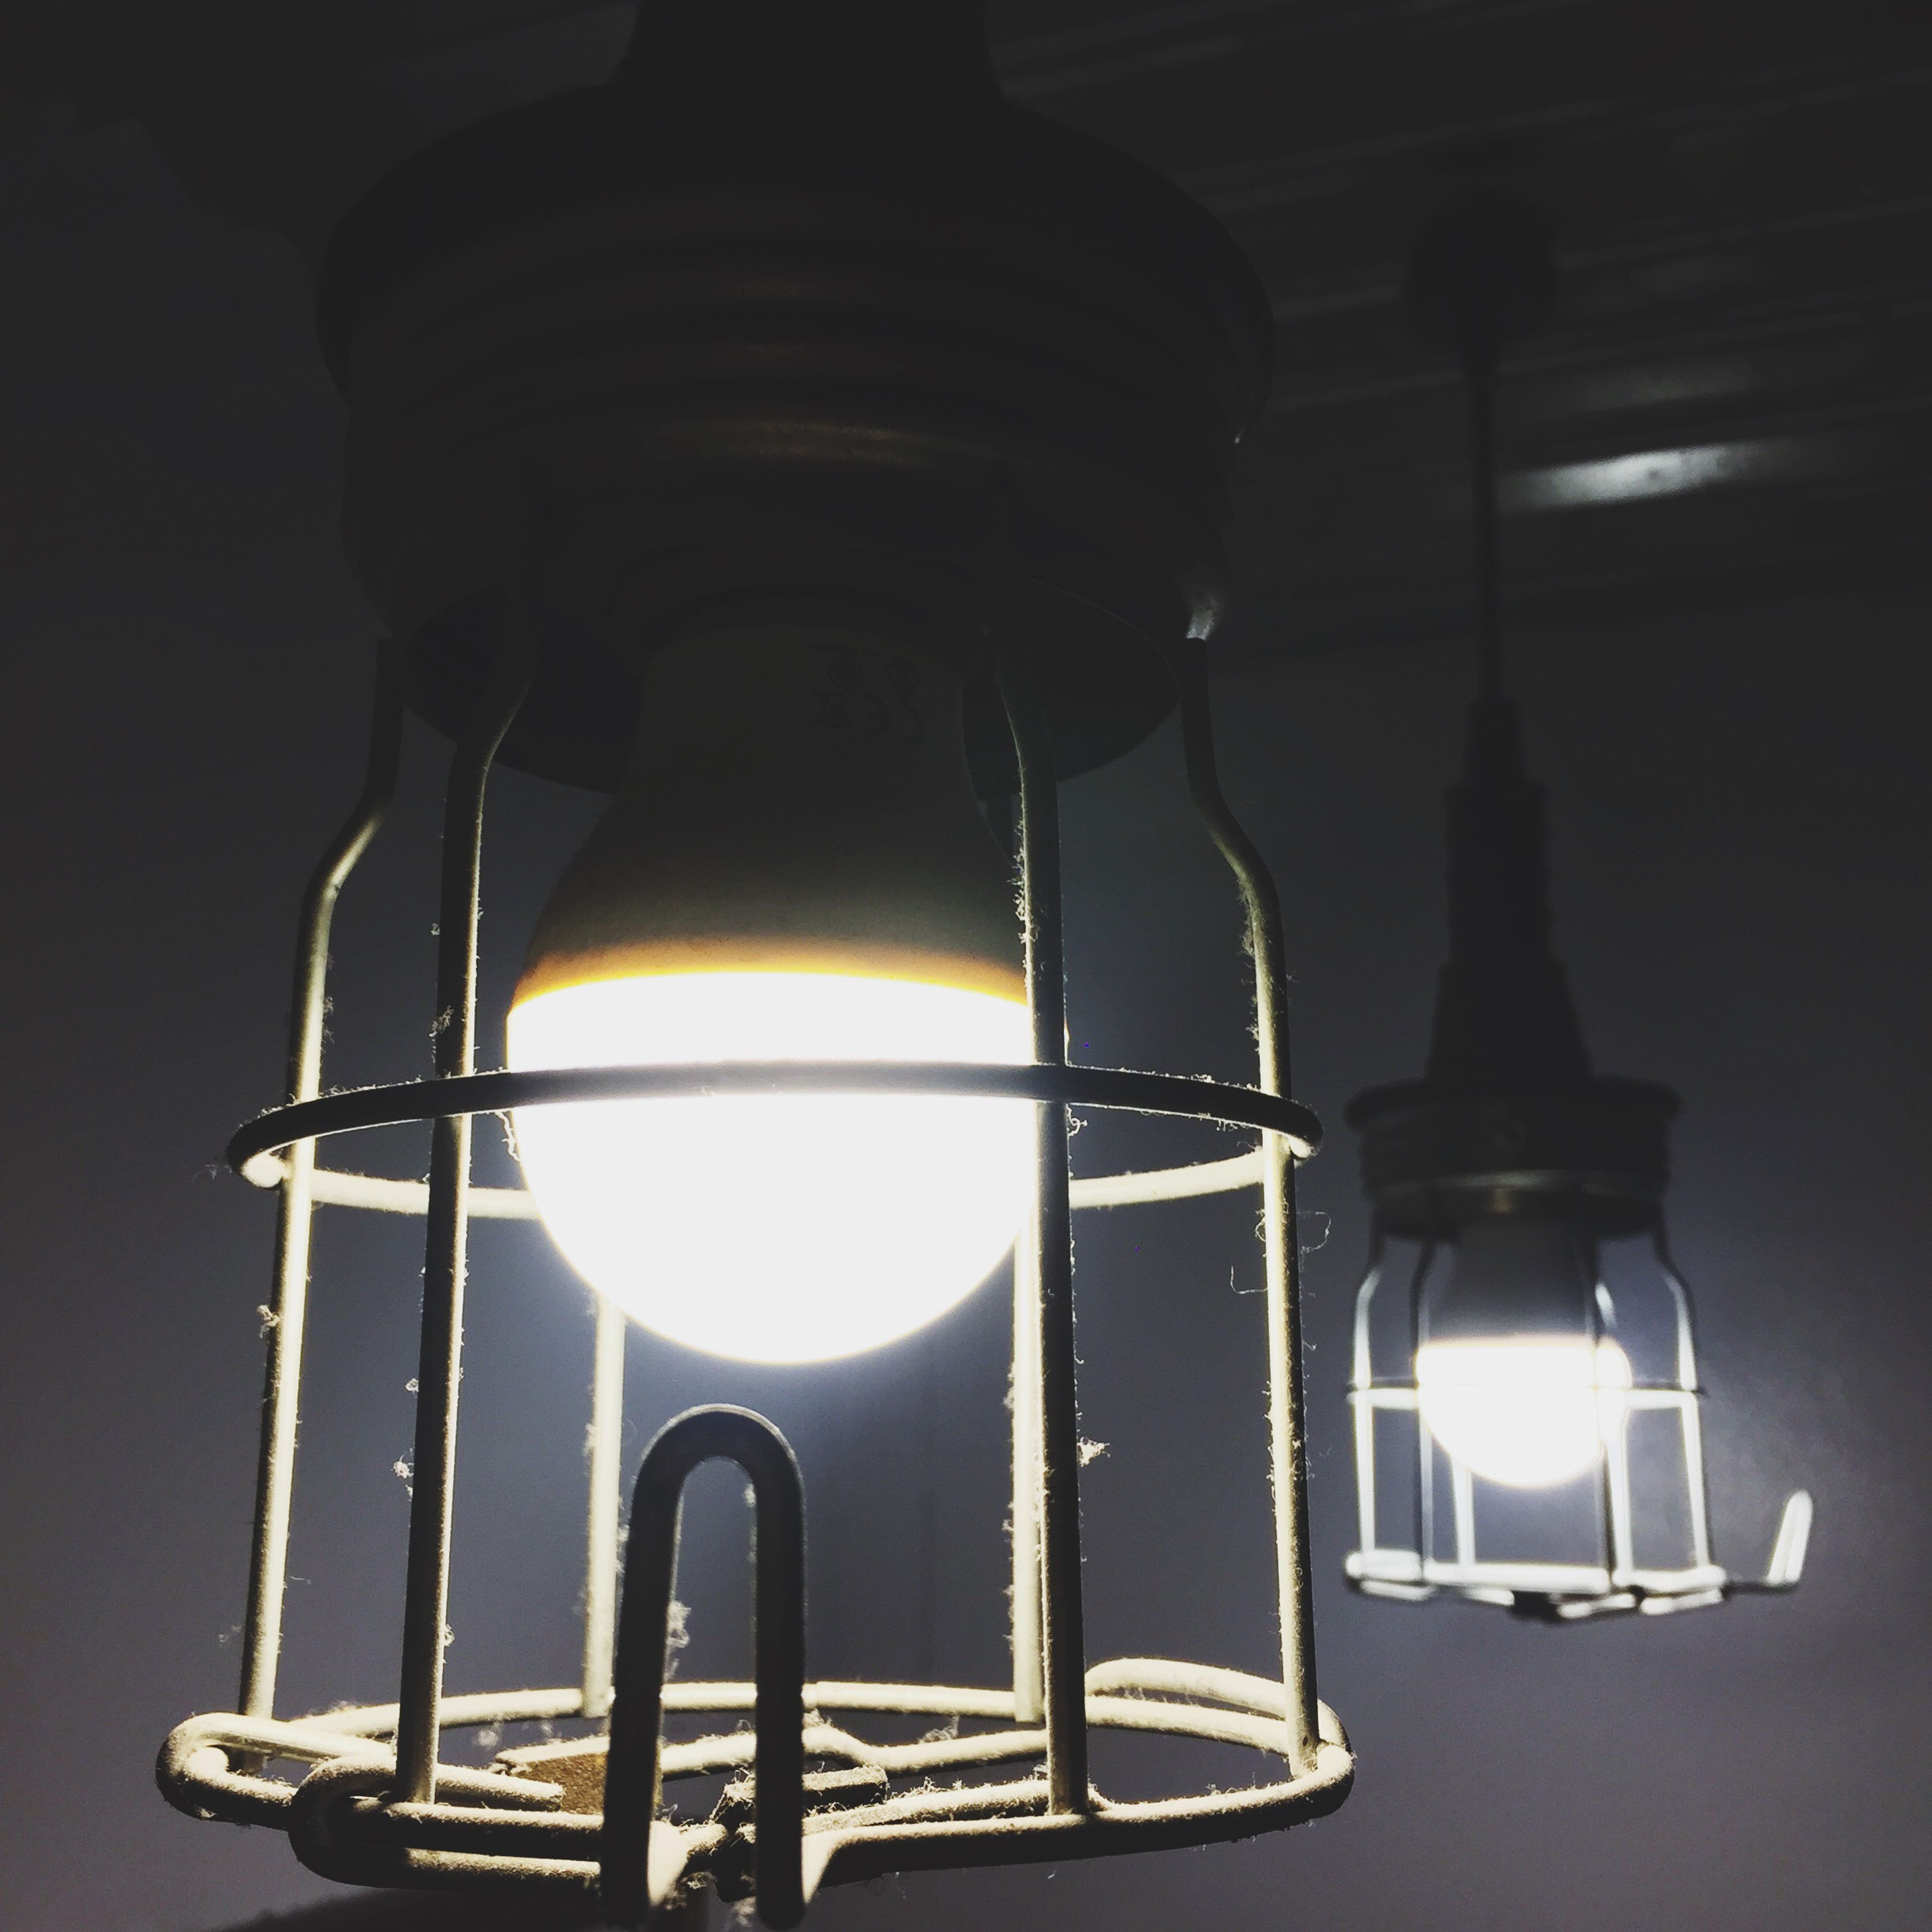 lighting equipment, illuminated, no people, indoors, day